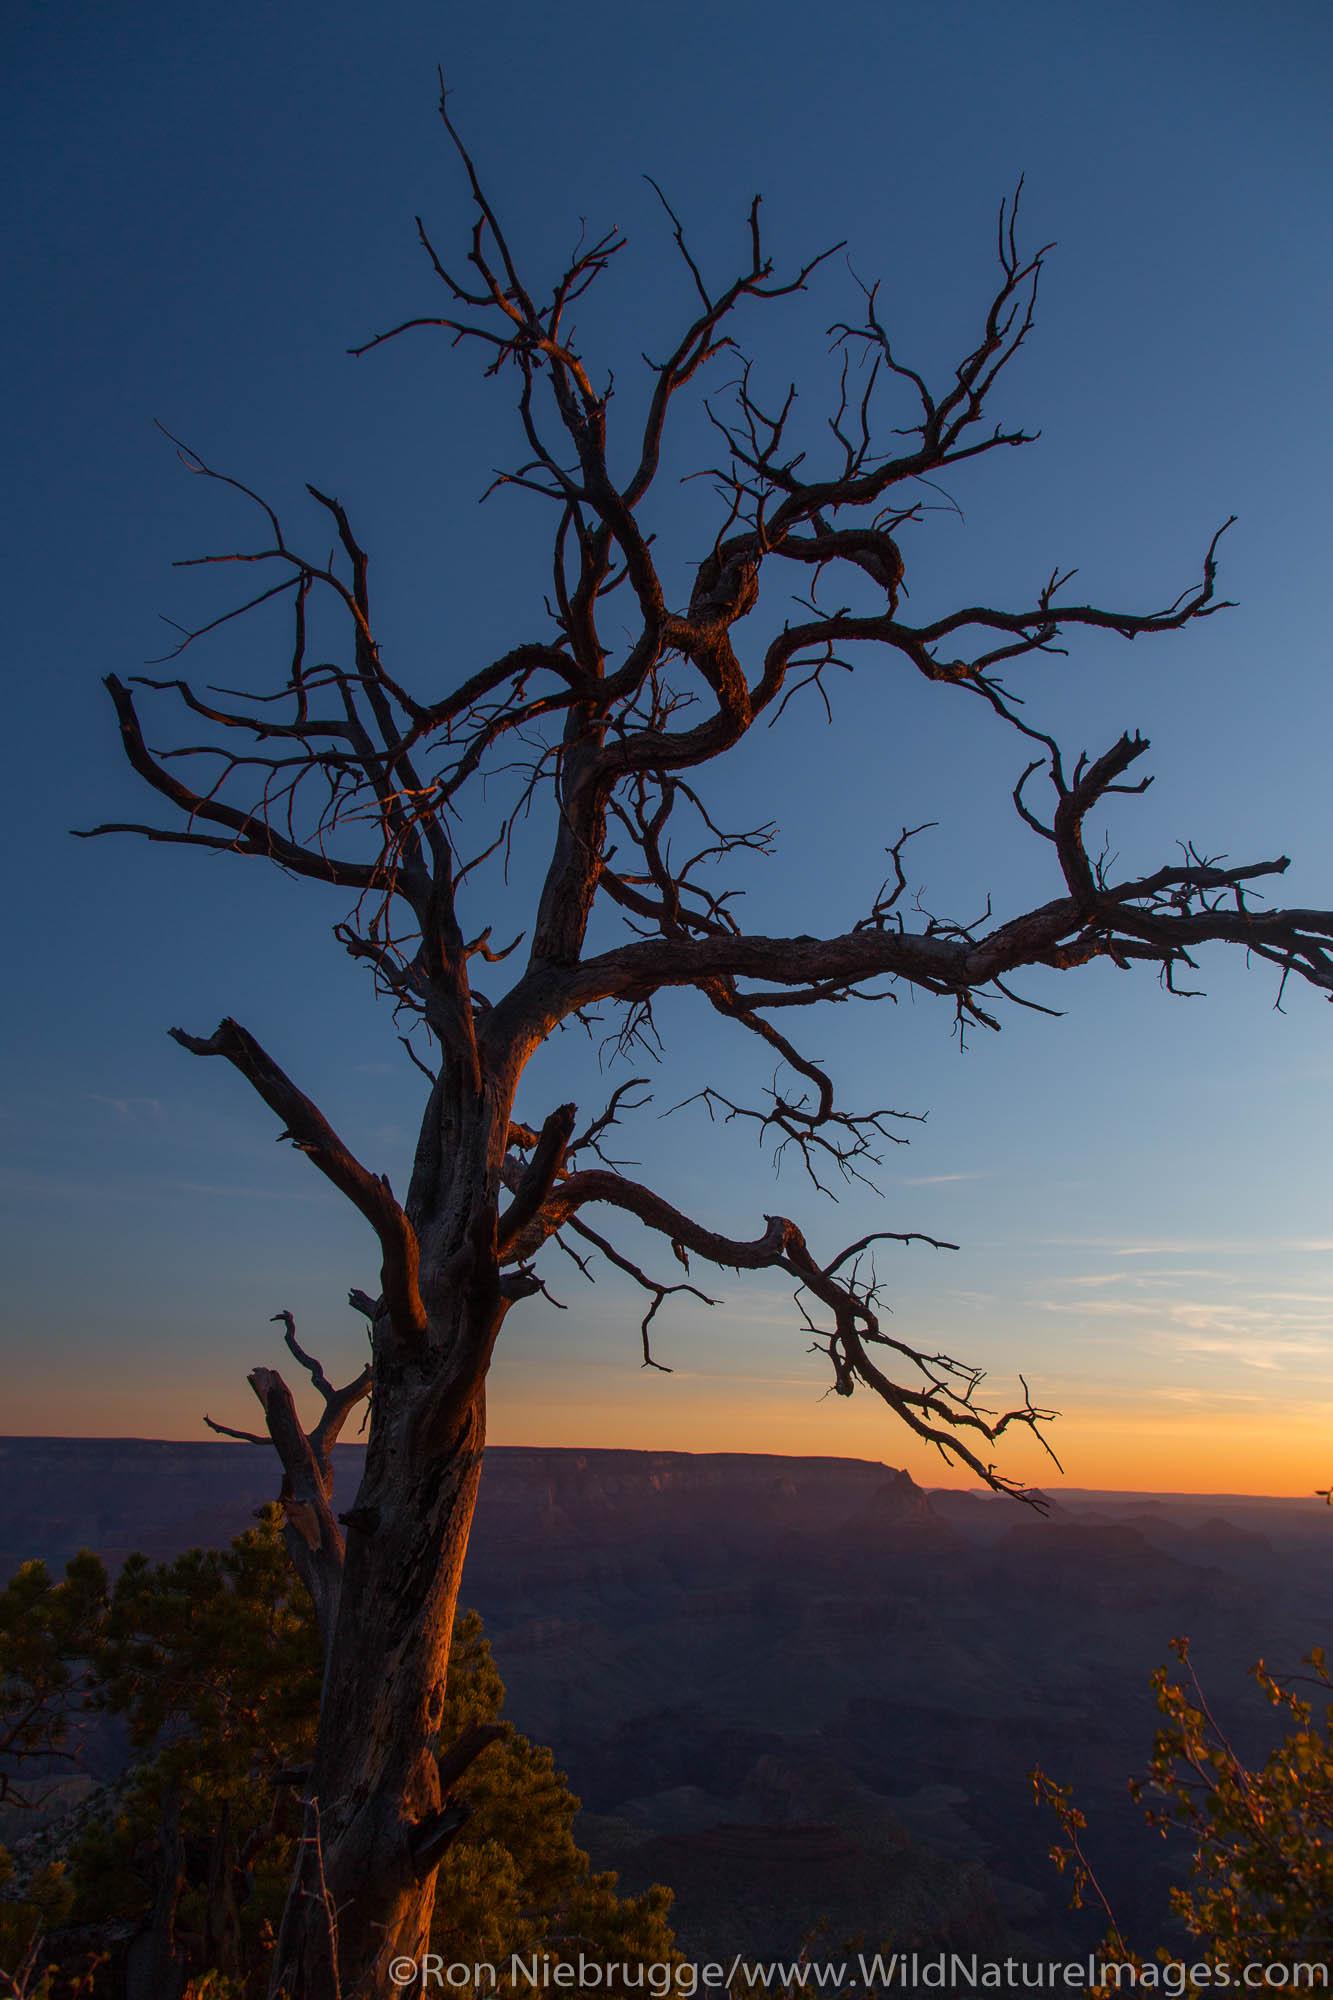 Grand Canyon National Park, Arizona.